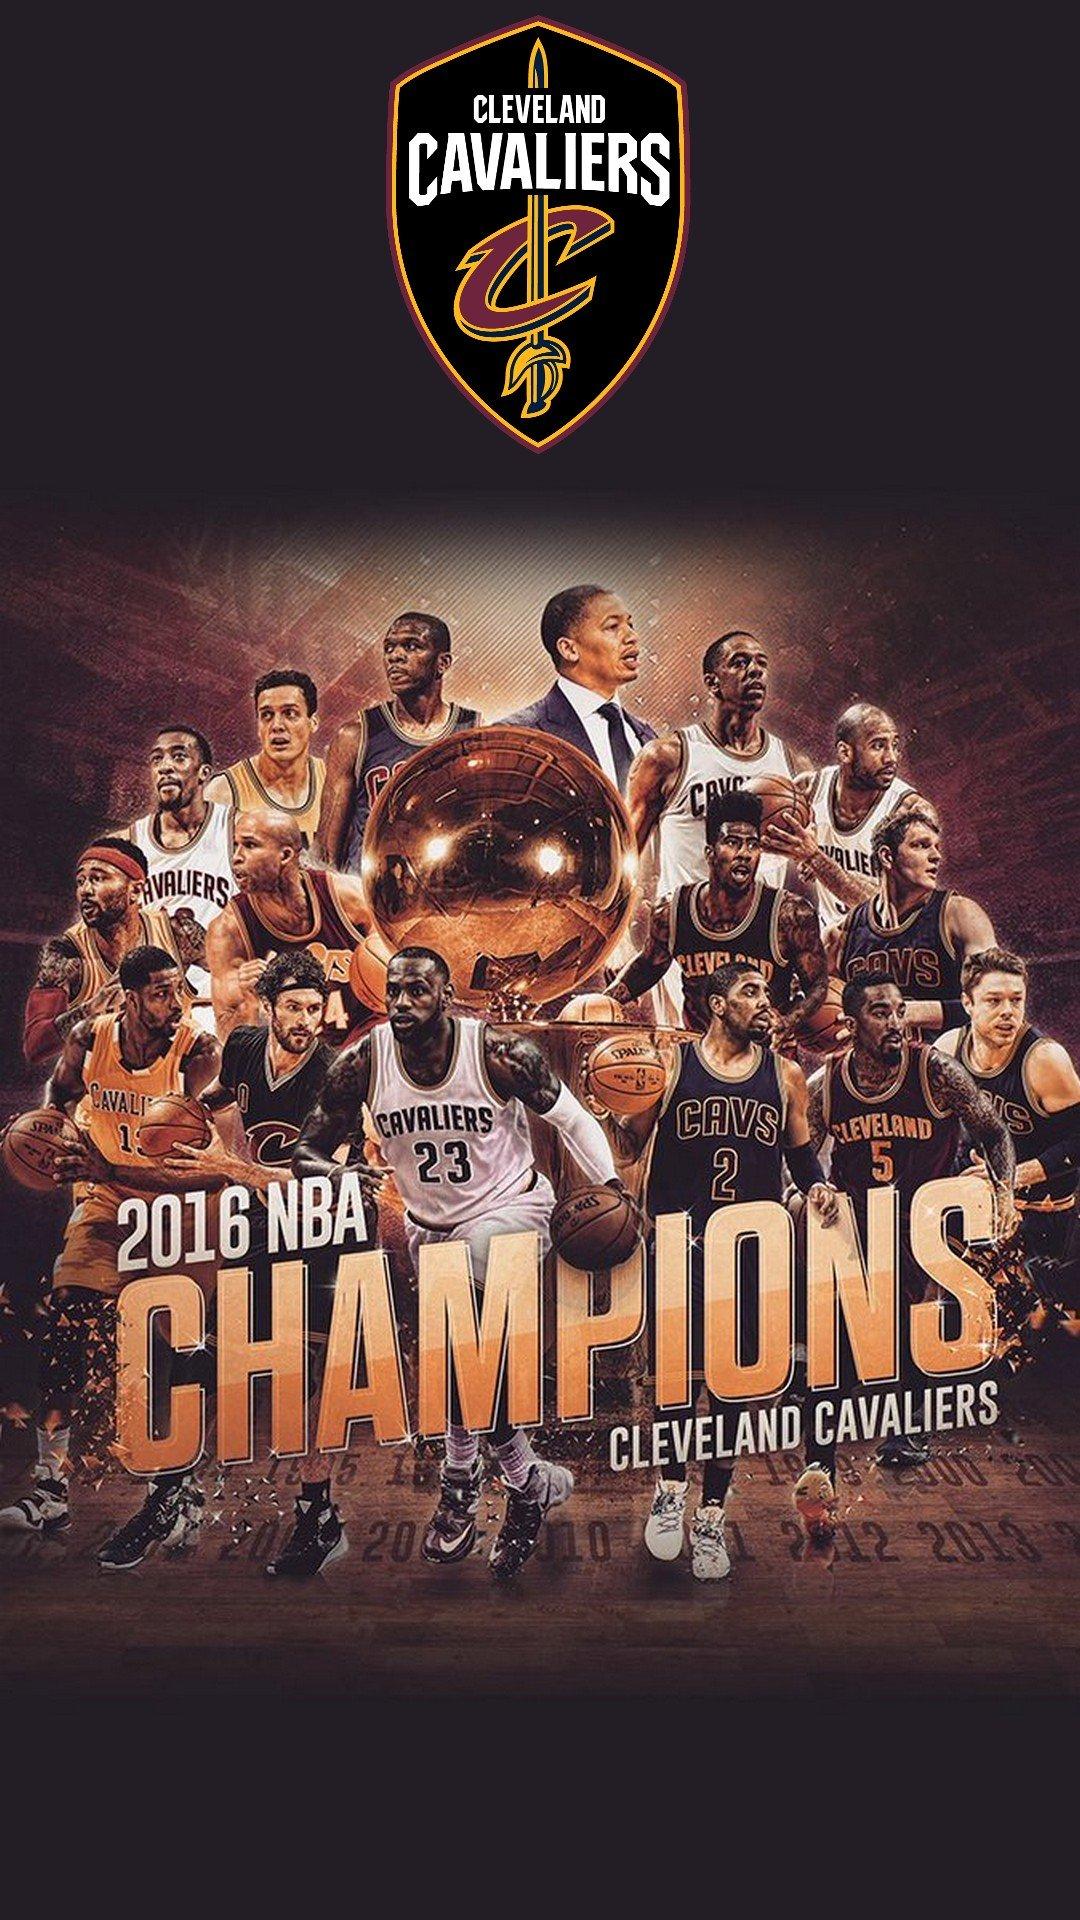 Cleveland Cavaliers NBA Wallpaper Mobile 2020 Basketball Wallpaper 1080x1920